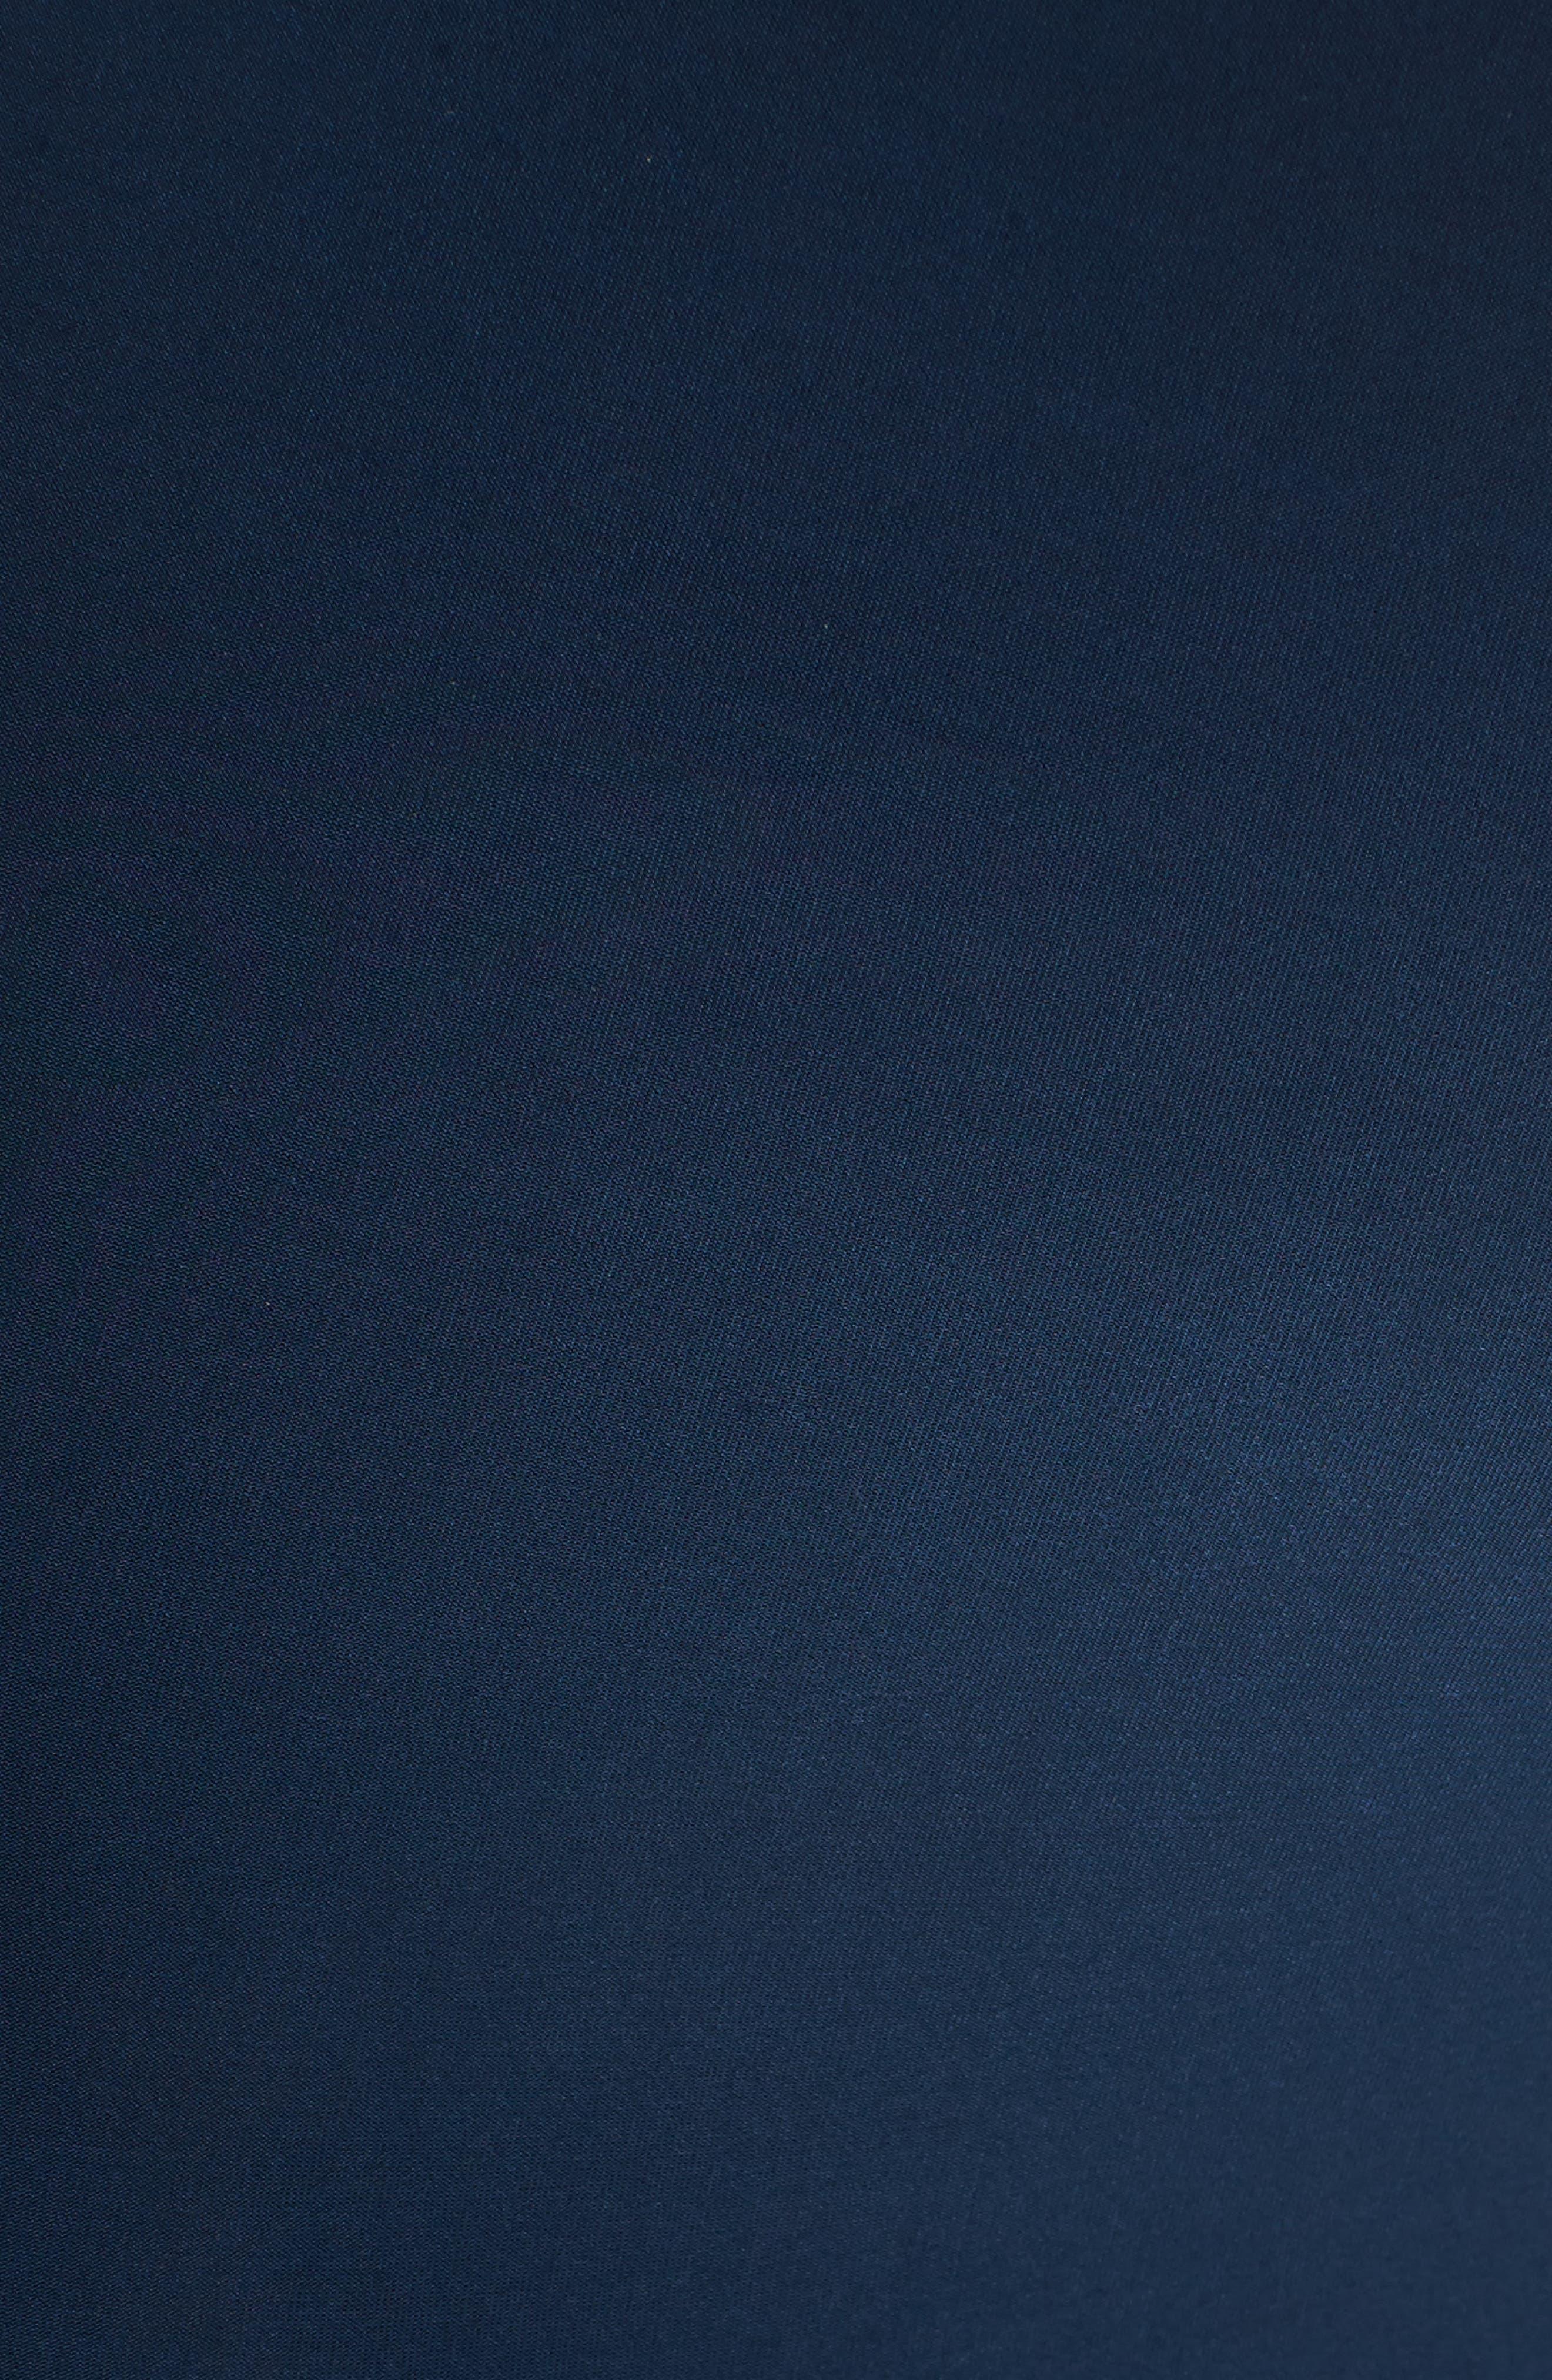 'Carla' Knot Front Jersey Maternity Dress,                             Alternate thumbnail 5, color,                             DARKEST NAVY